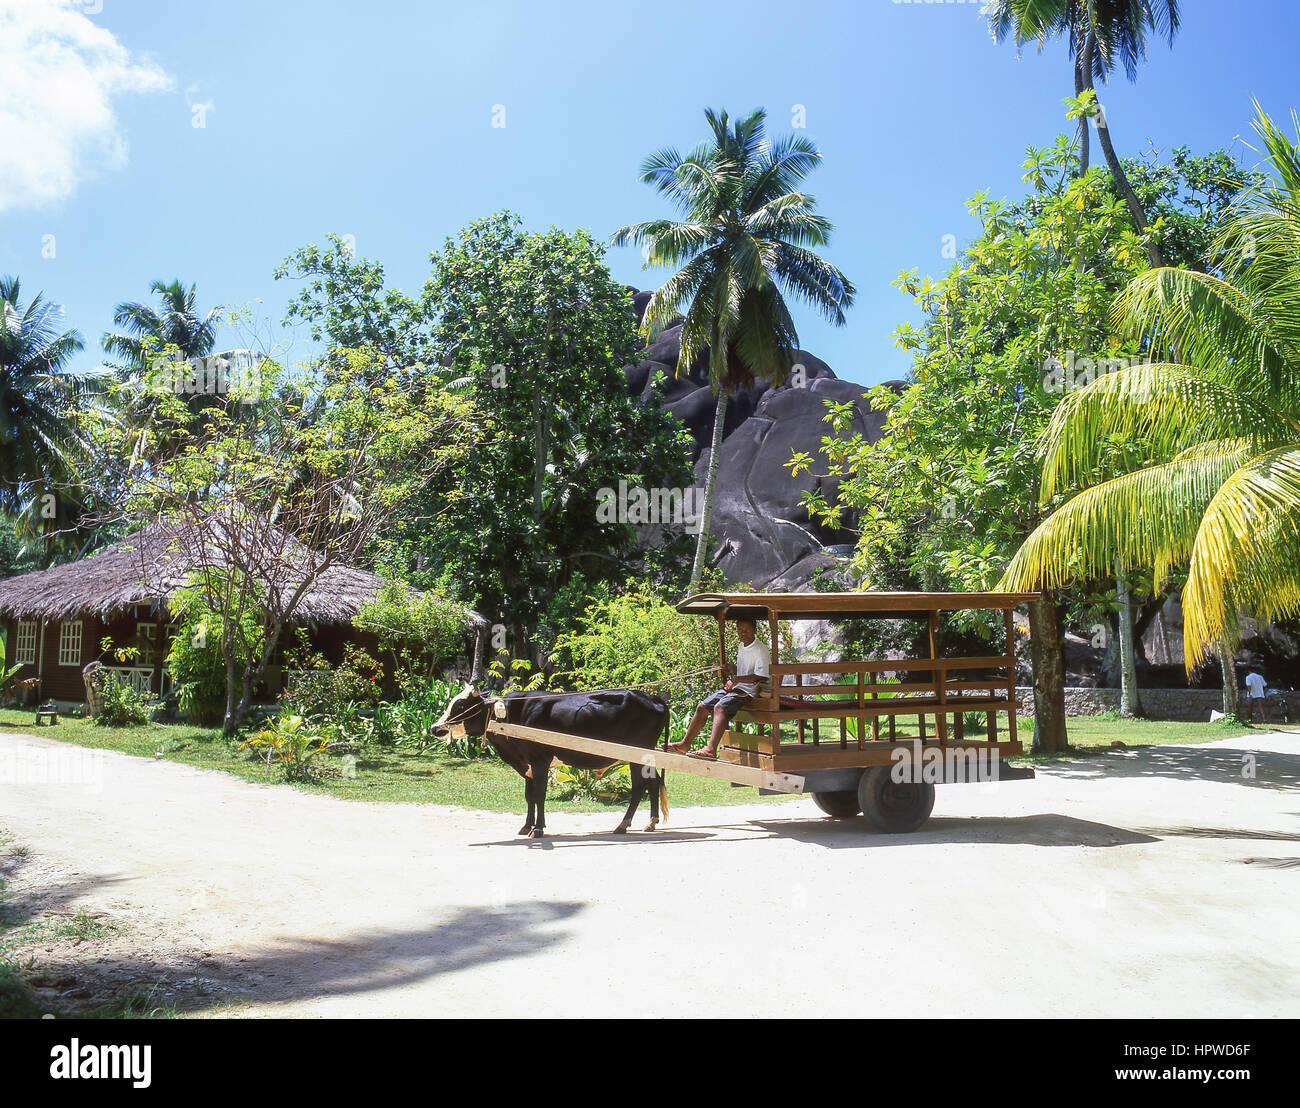 Bullock Cart, Anse Source D'Argent Beach, La Digue, Republic of Seychelles - Stock Image